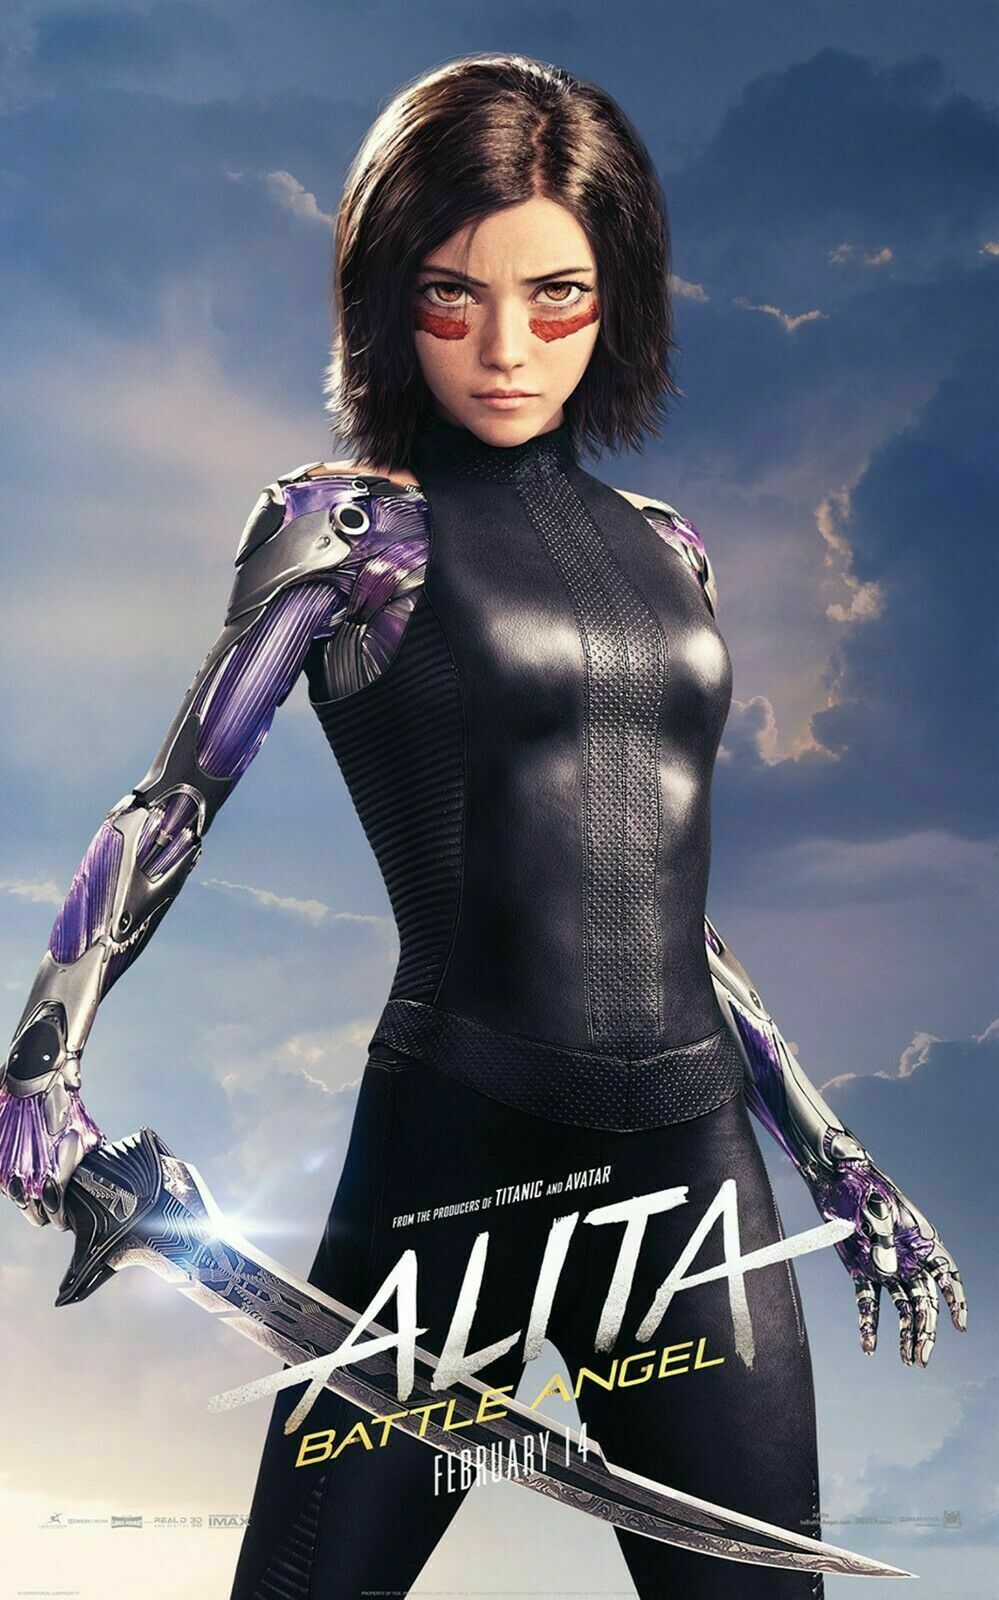 217227 Hot movie-Alita Battle Angel Decor PRINT POSTER CA